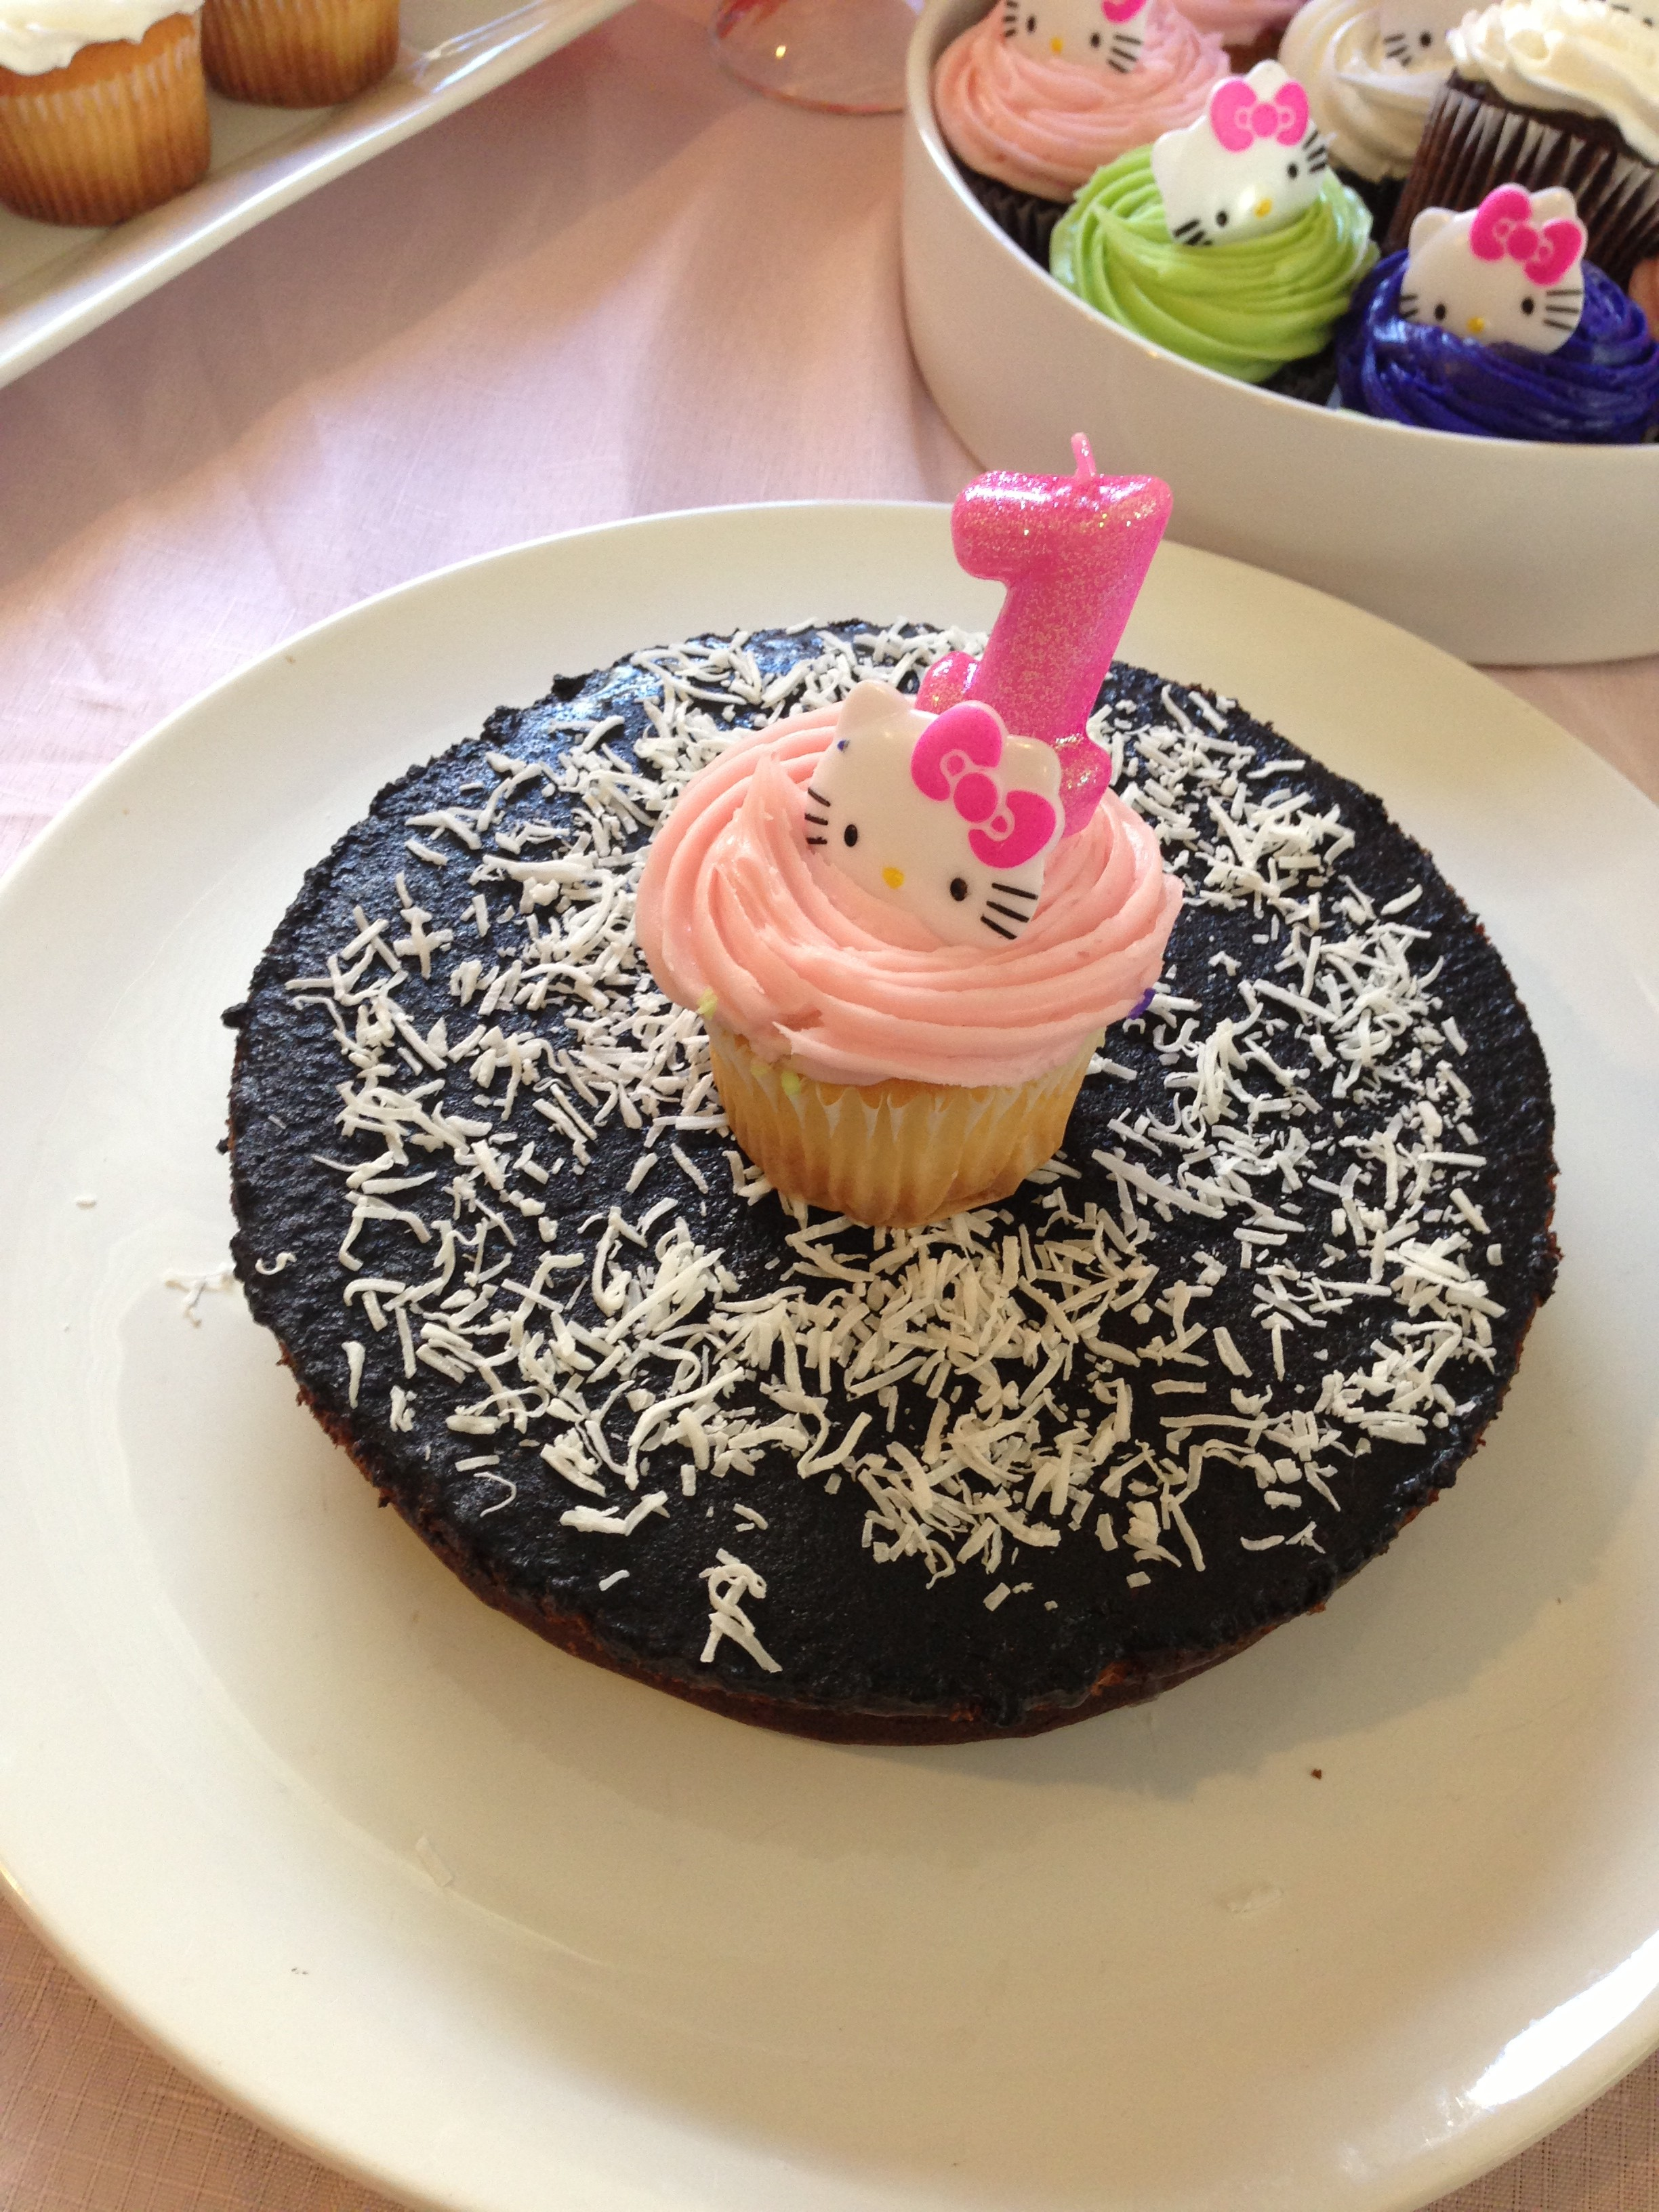 Blondie's Decadent Chocolate Birthday Cake